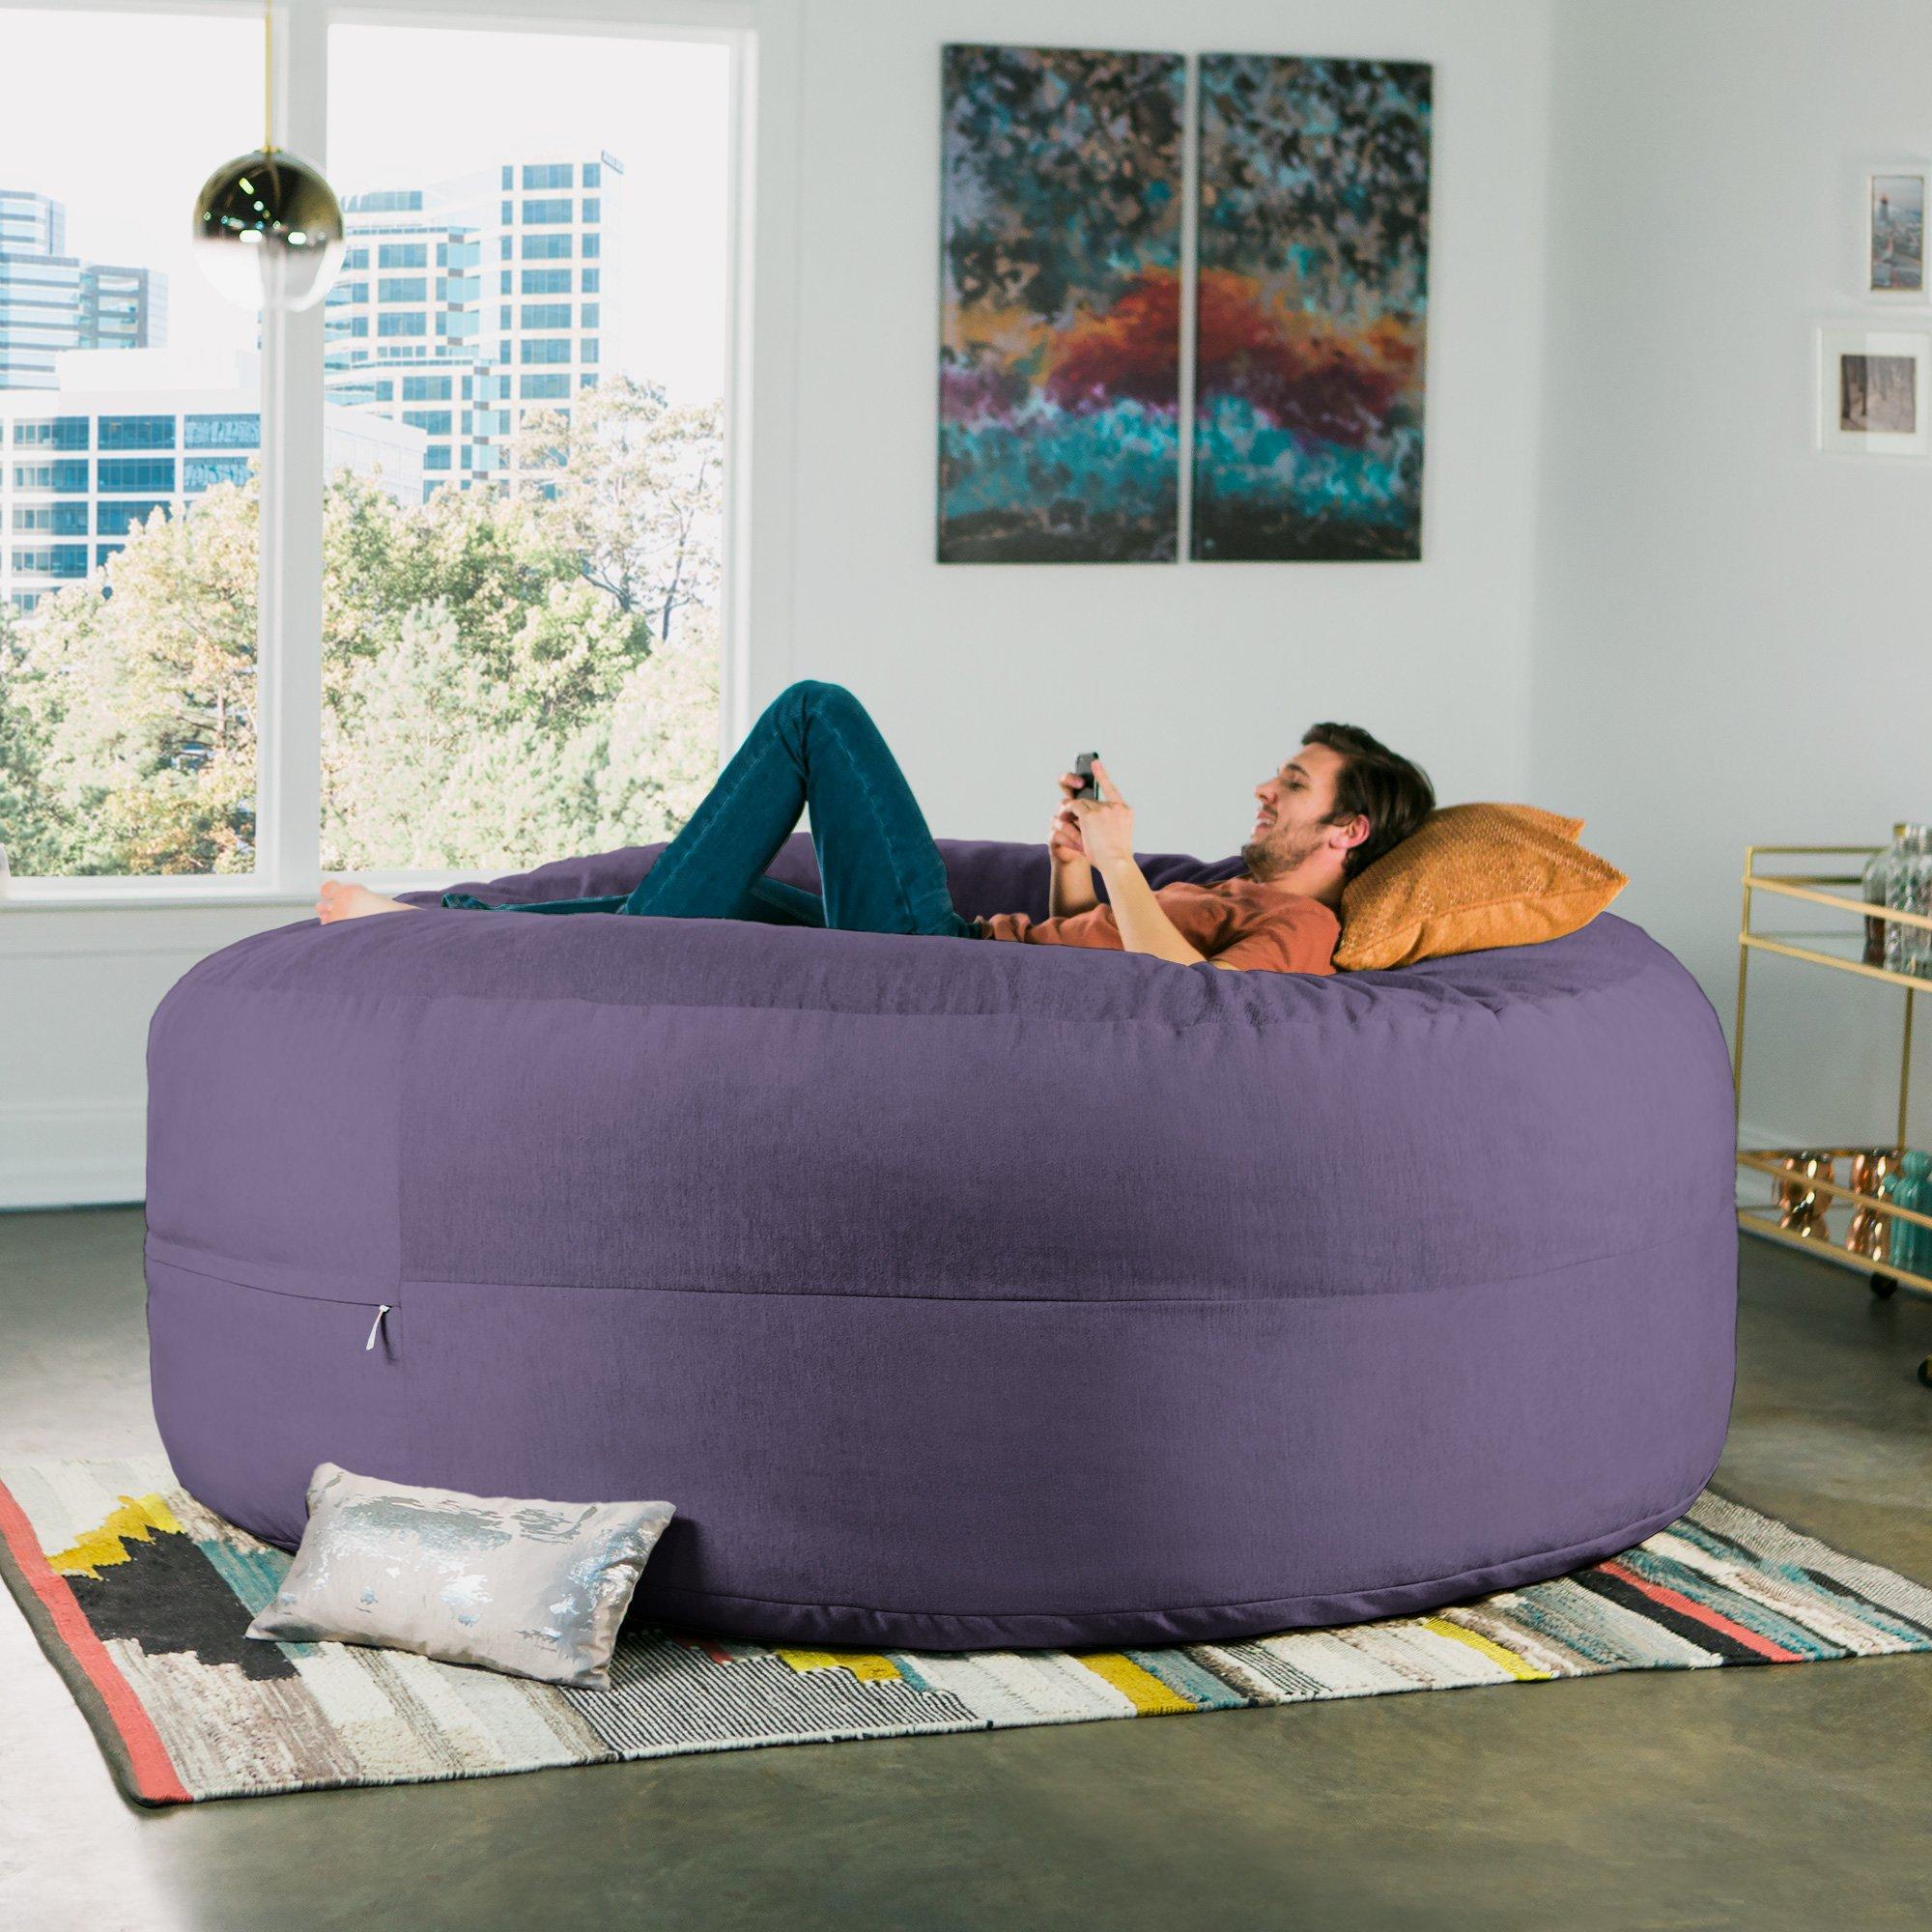 Jaxx Cocoon 8 Foot Huge Sleeper Bean Bag Bed - Chenille, Plum by Jaxx (Image #3)